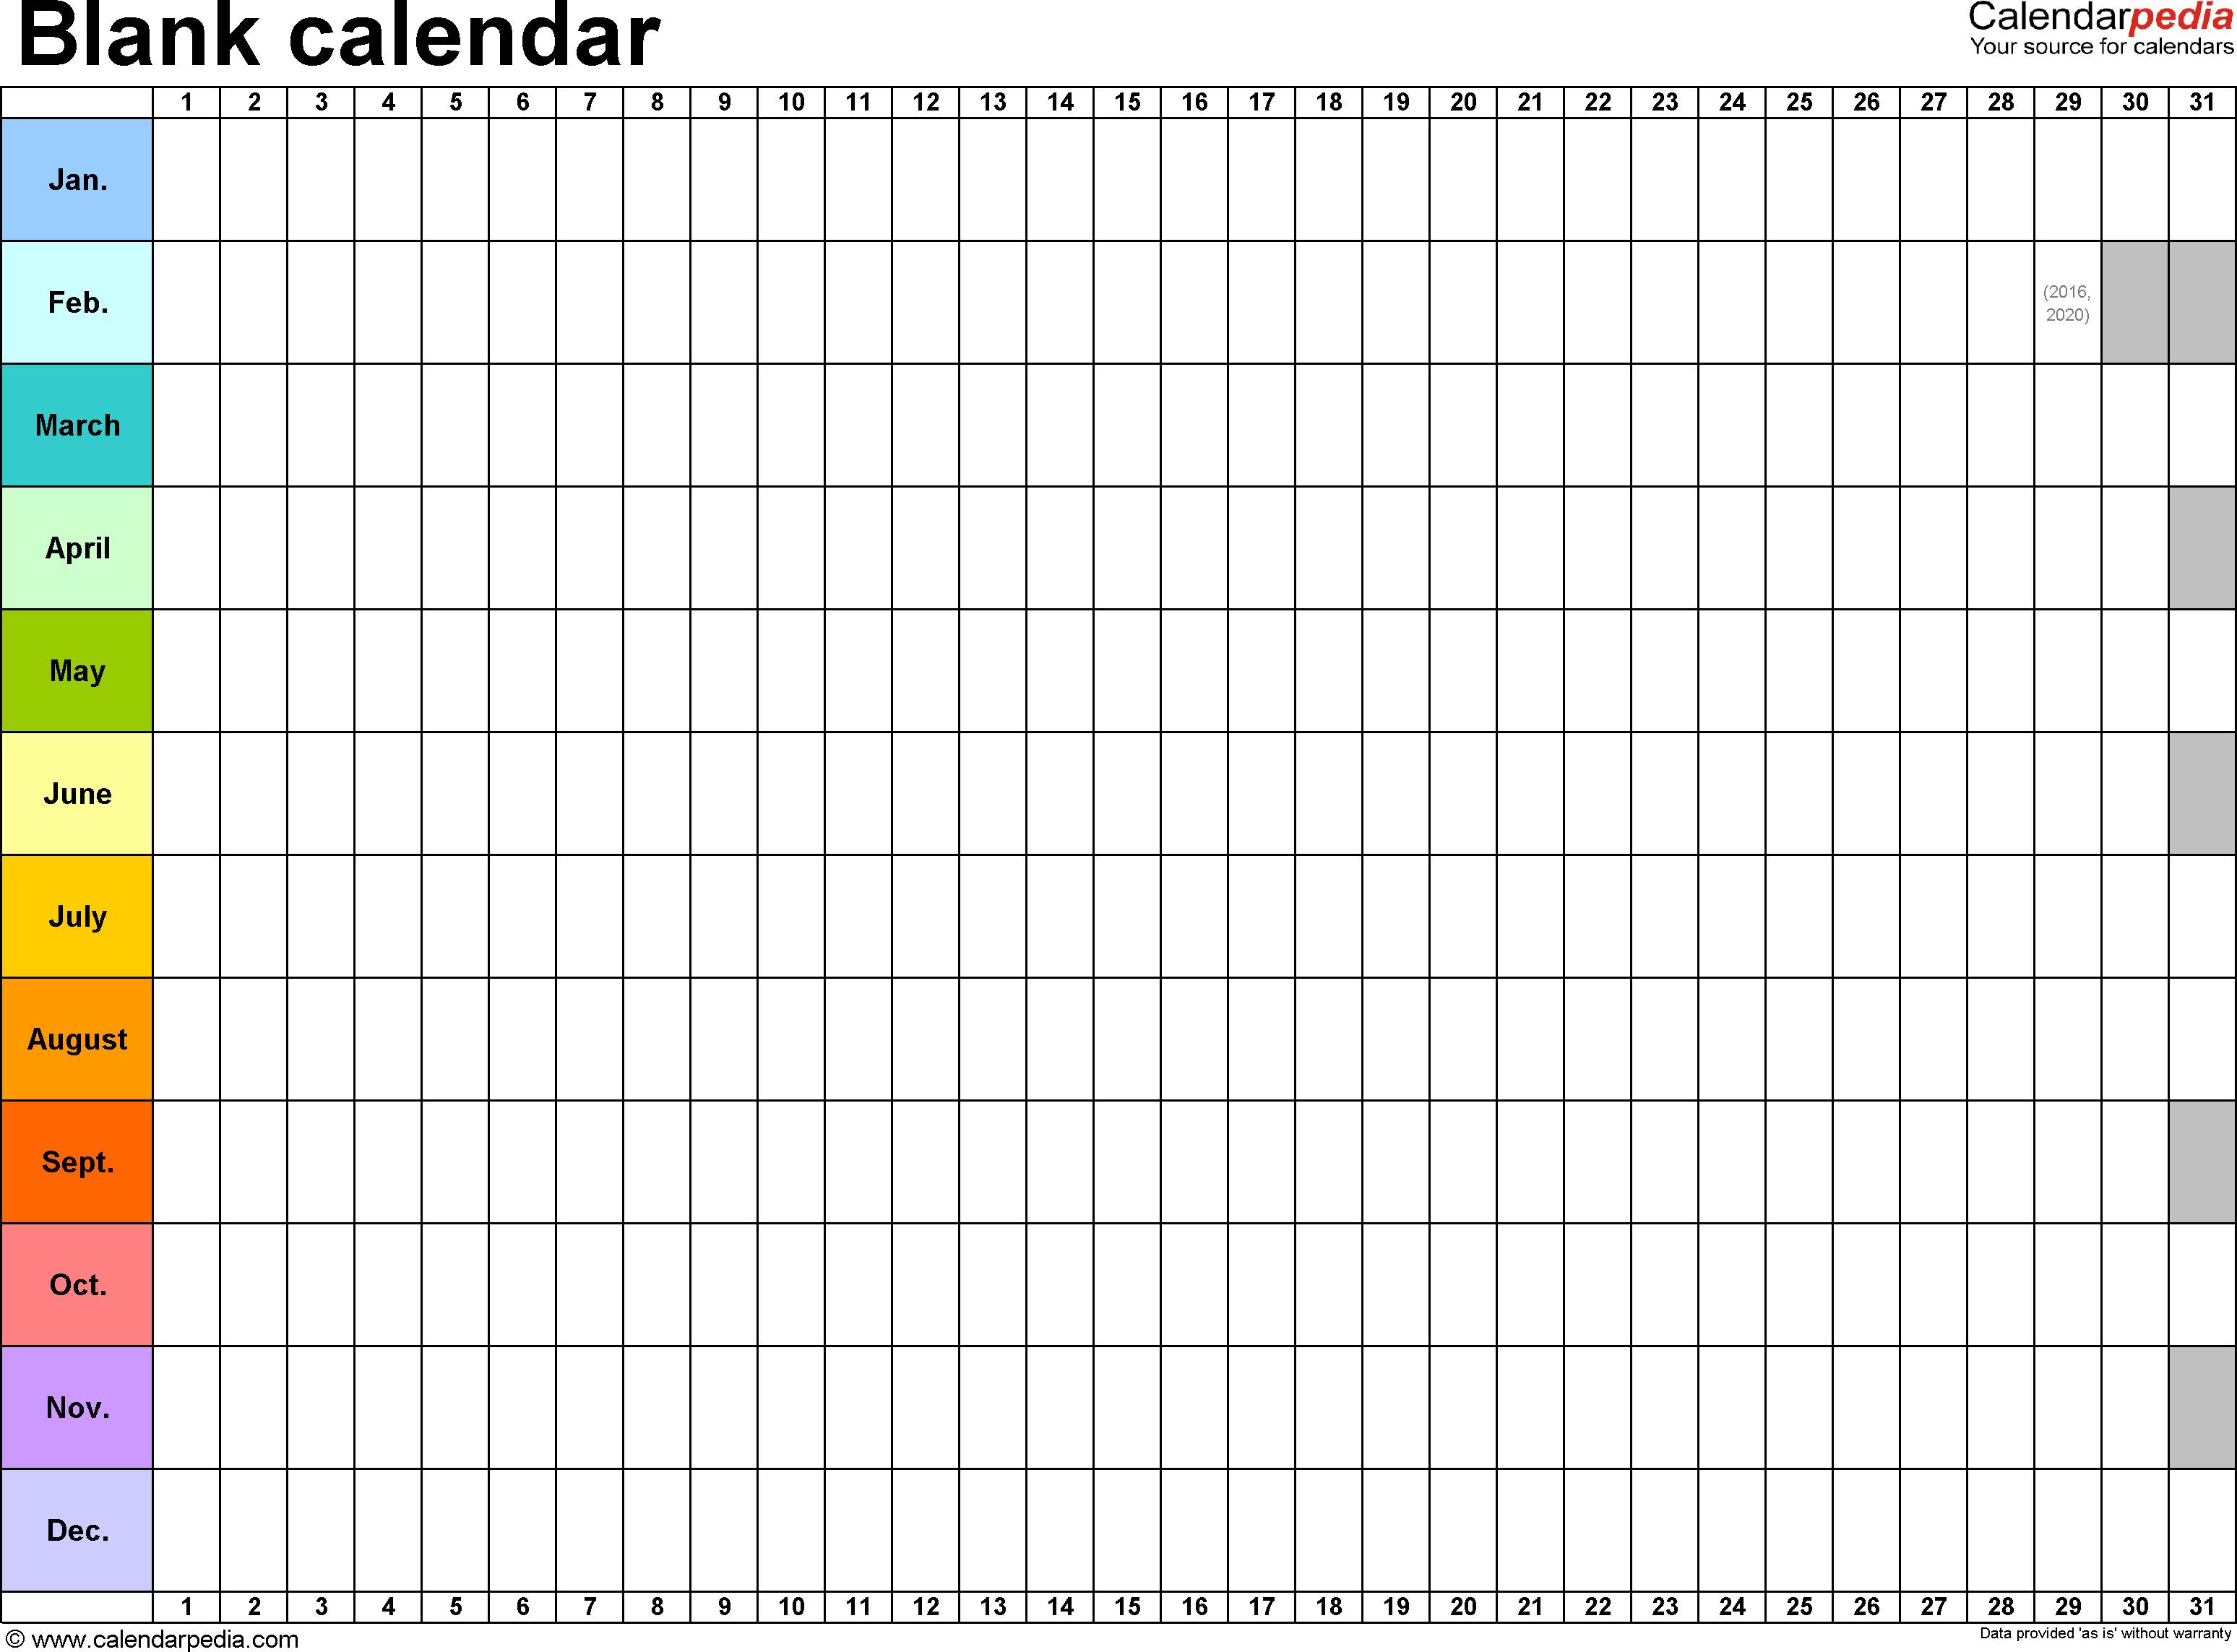 Blank Calendar - 9 Free Printable Microsoft Word Templates inside Template Of A Blank Calendar Of A Month